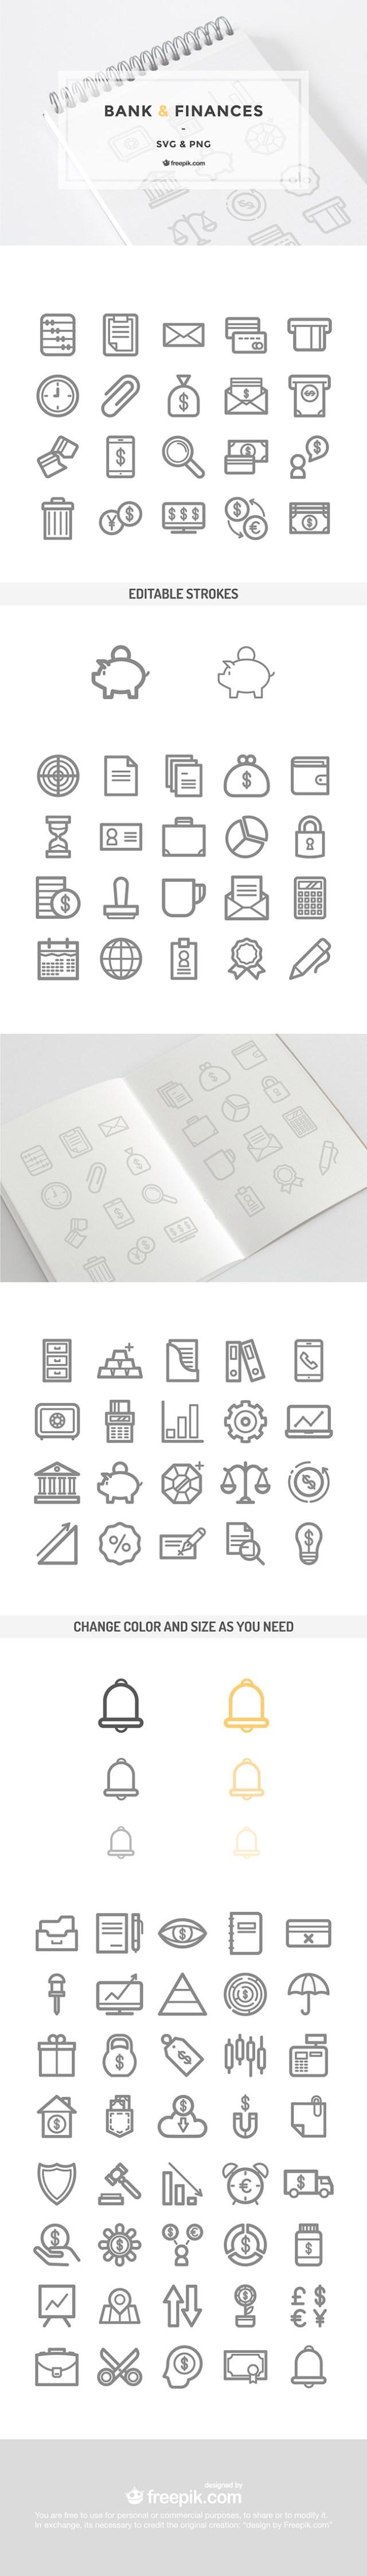 Bank-&-finances-icons-01